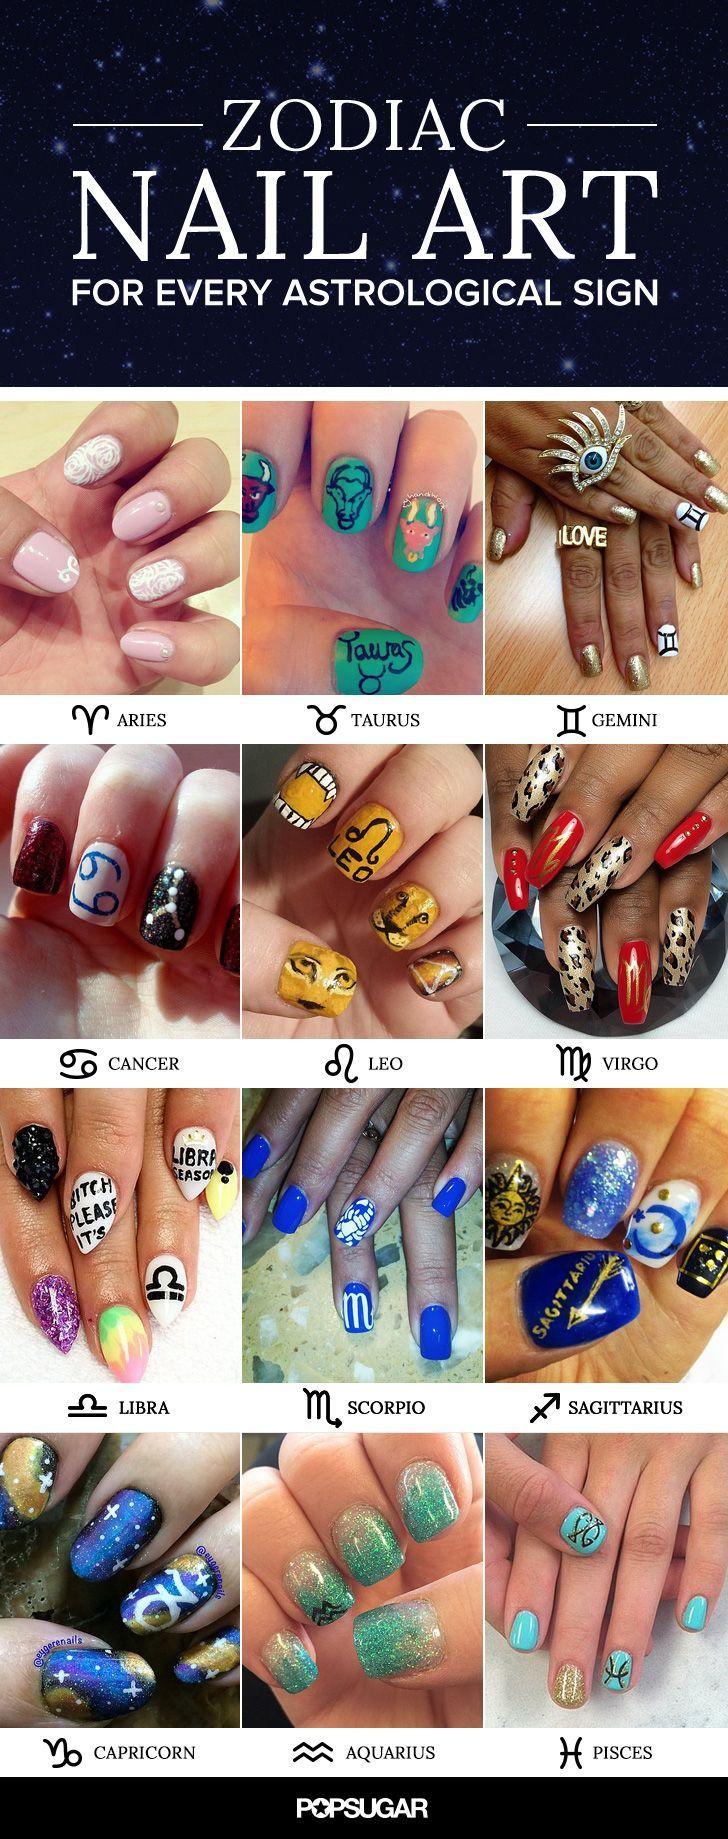 Zodiac Nail Art Ideas That Are More Spiritual Than Your